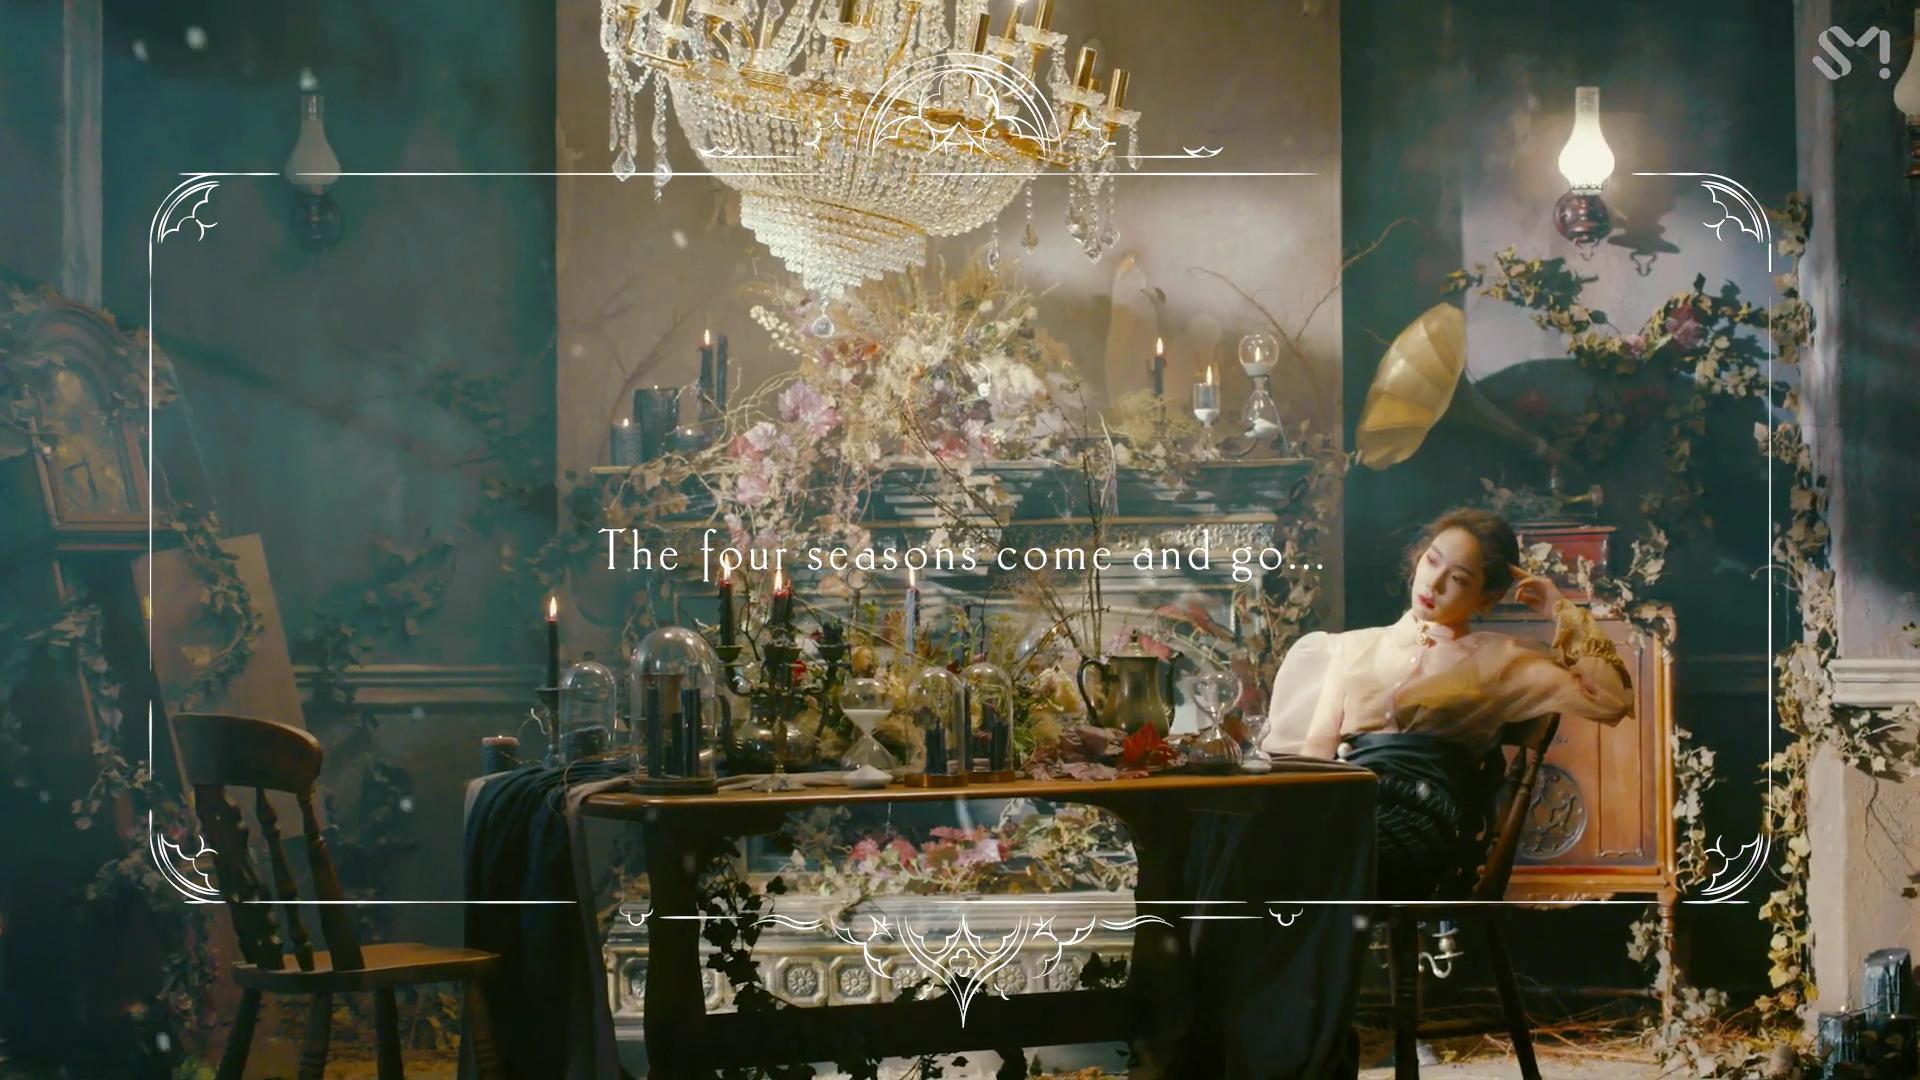 Ca sĩ Taeyeon trong MV Four Seasons